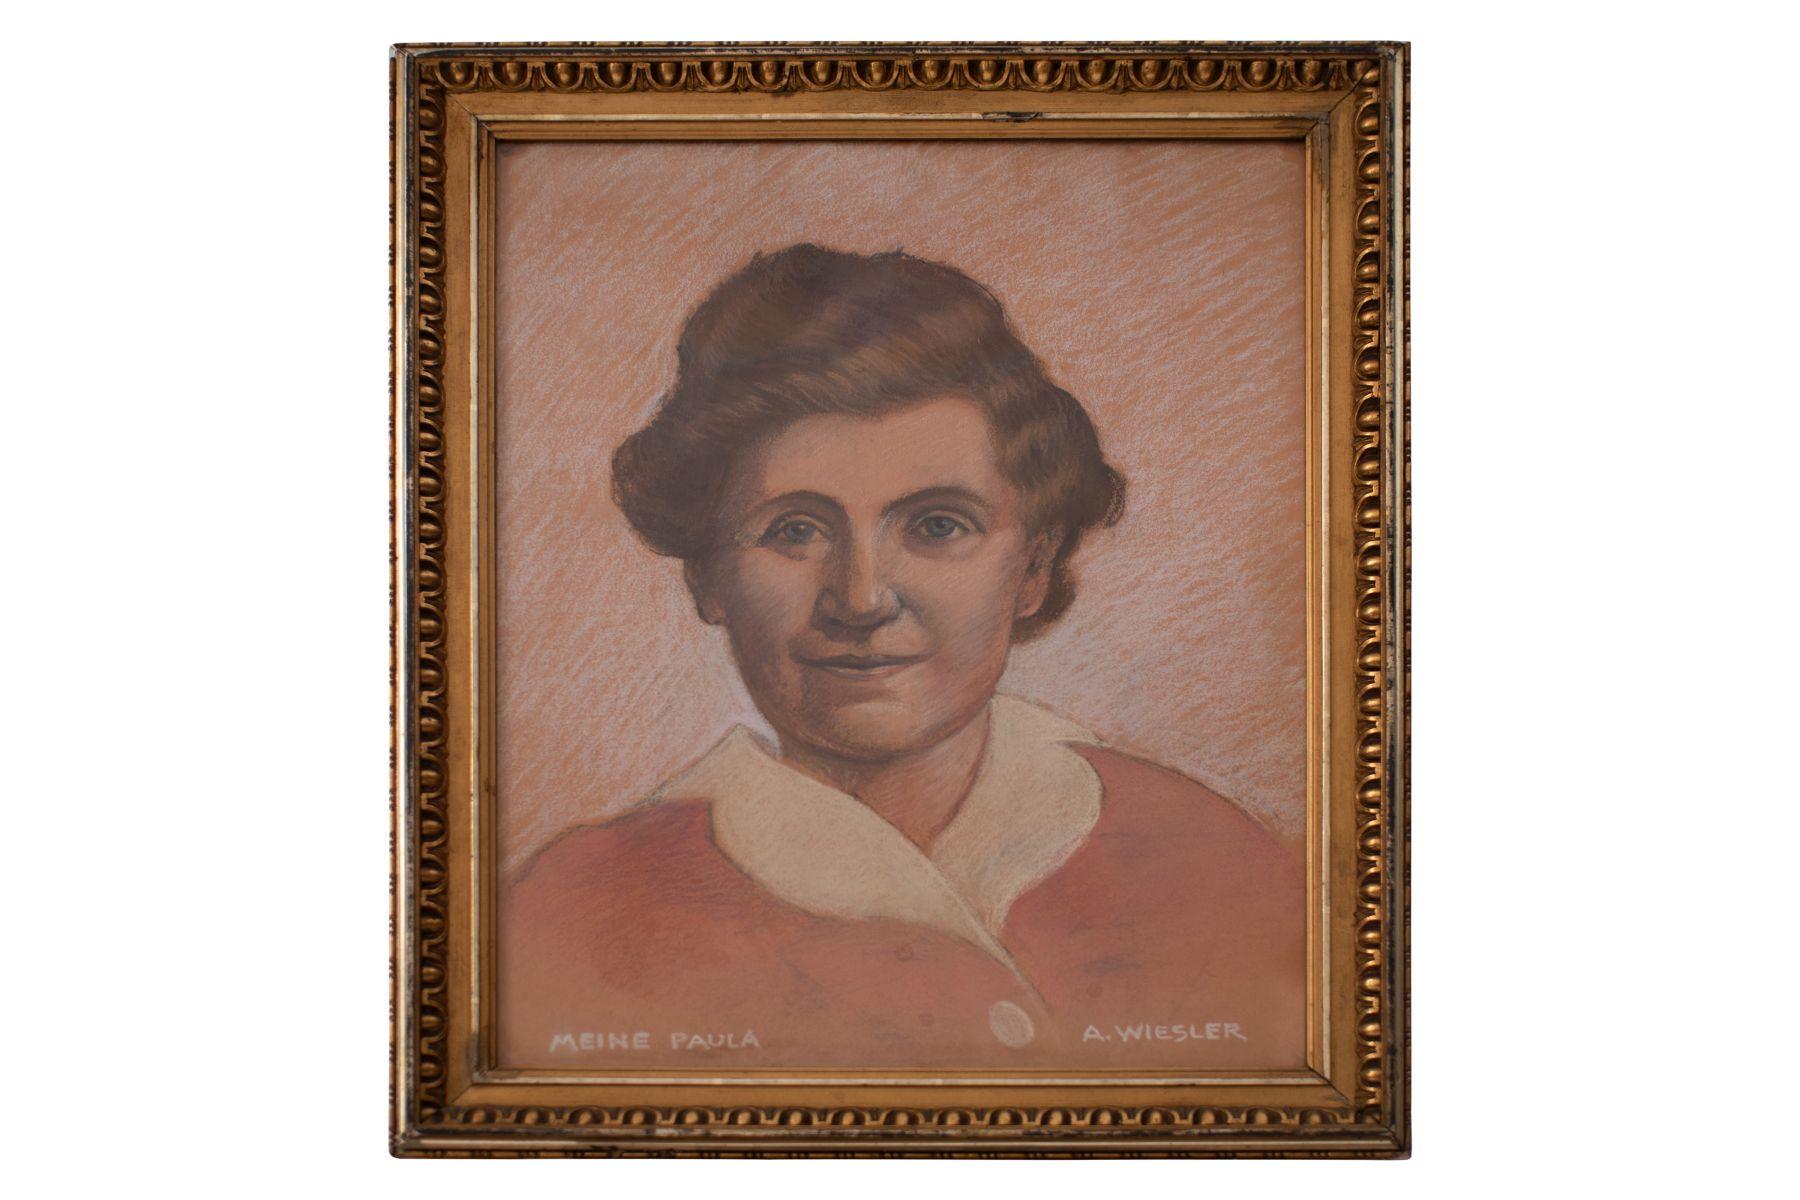 "#103 Portrait of companion ""Paula"" | Adolf Wiesler (1878-1958) ""Meine Paula"" Image"